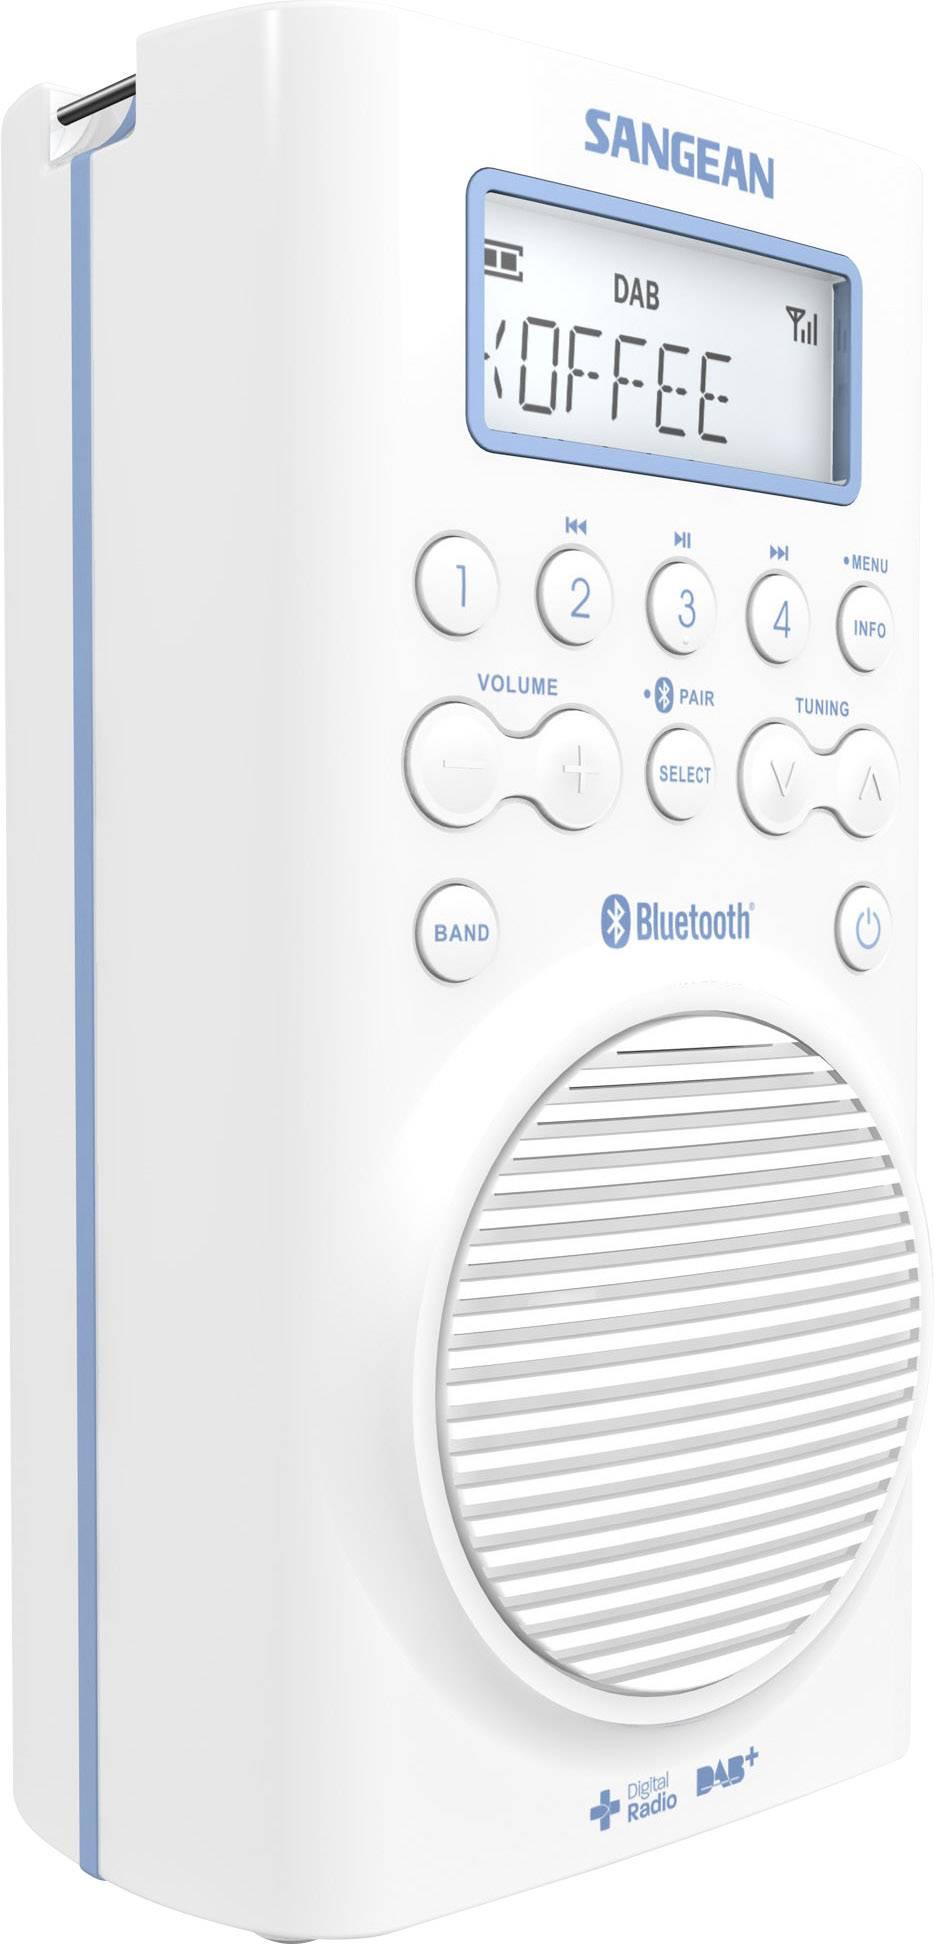 Sangean H205D Bathroom radio DAB+, FM Bluetooth waterproof ...